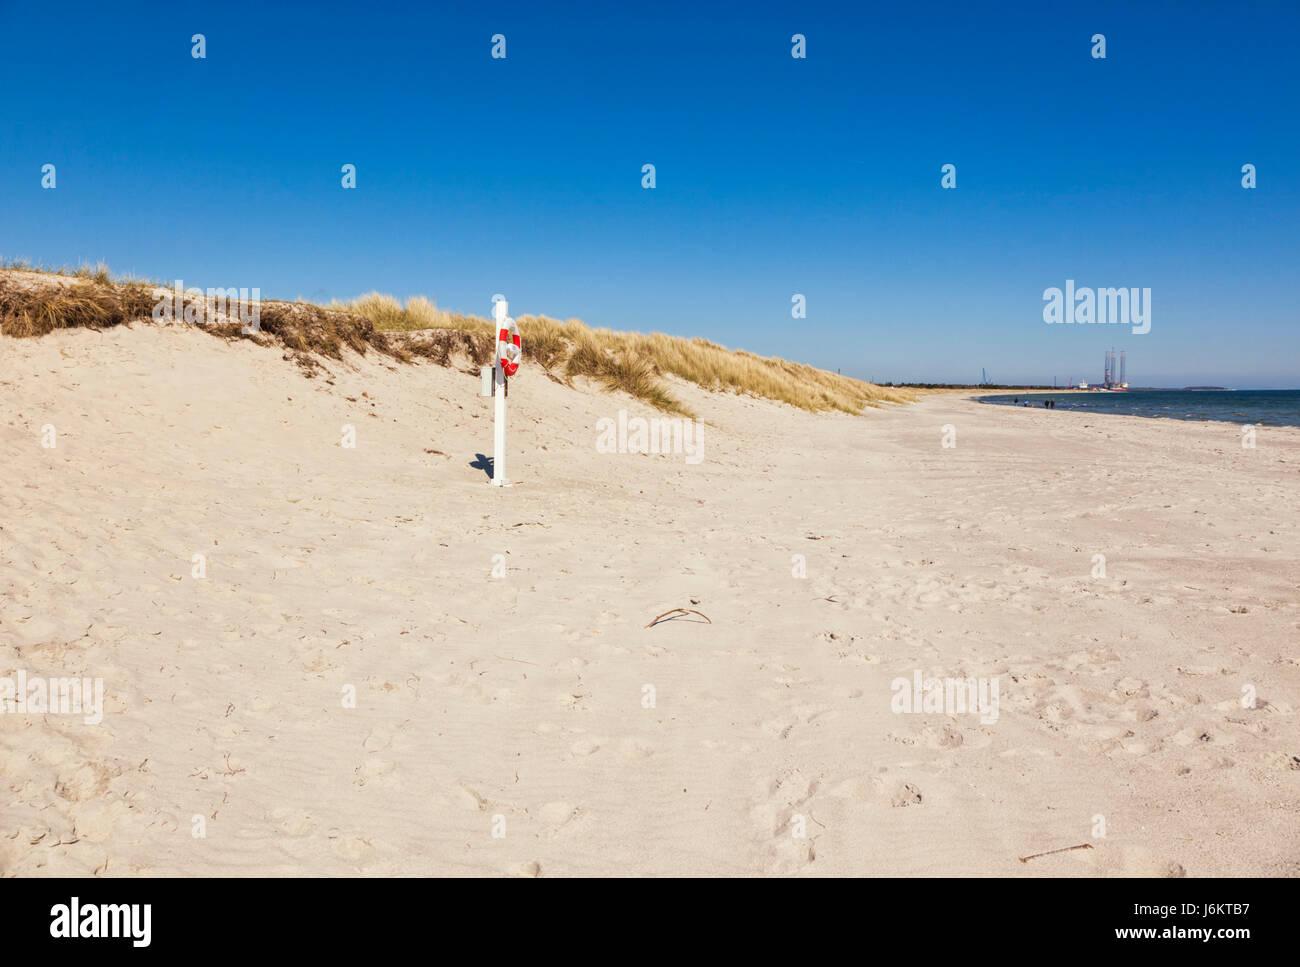 Beach of Grenaa on Baltic Sea coast of Jutland, Denmark. Life buoy in foreground. - Stock Image